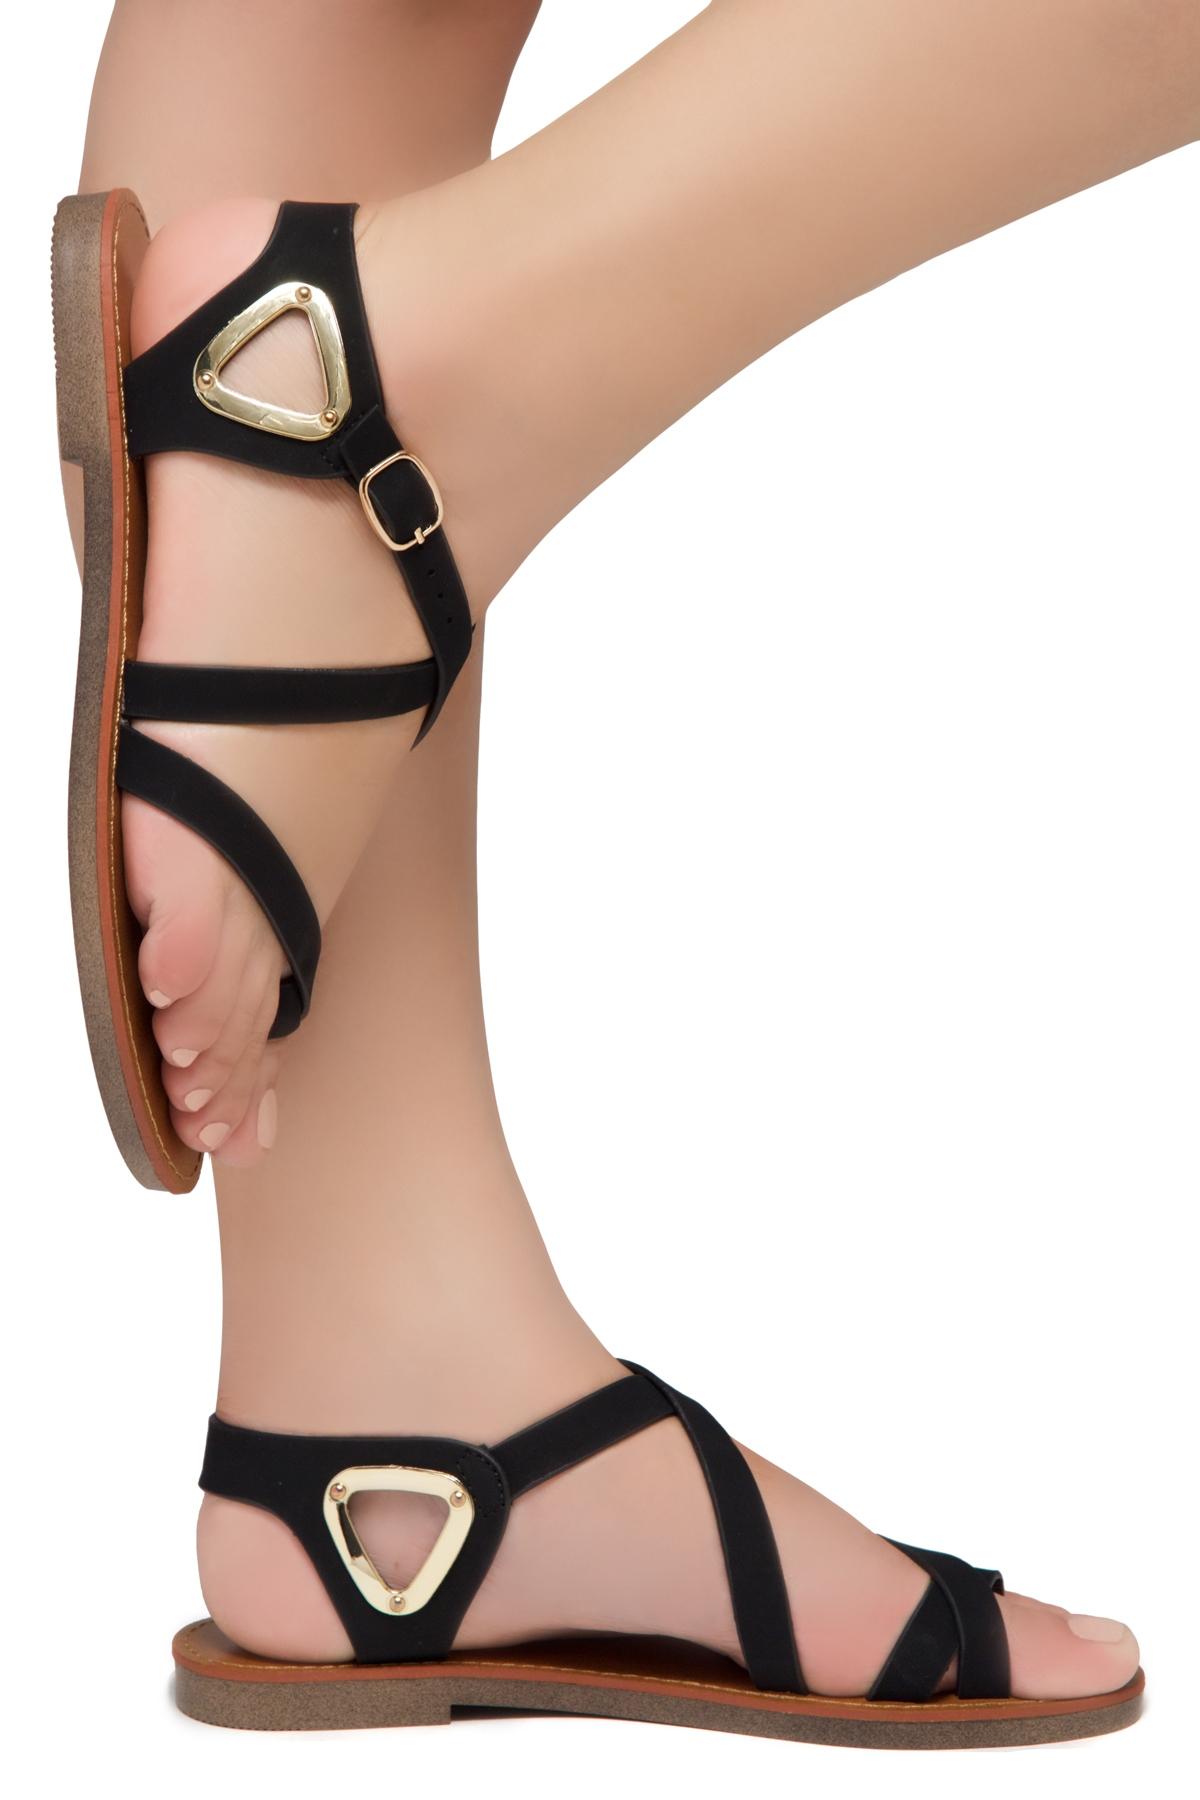 Gladiator Women's Shoe Needed Flat Toe Land Open Sandalsblack y8Nnm0wvO